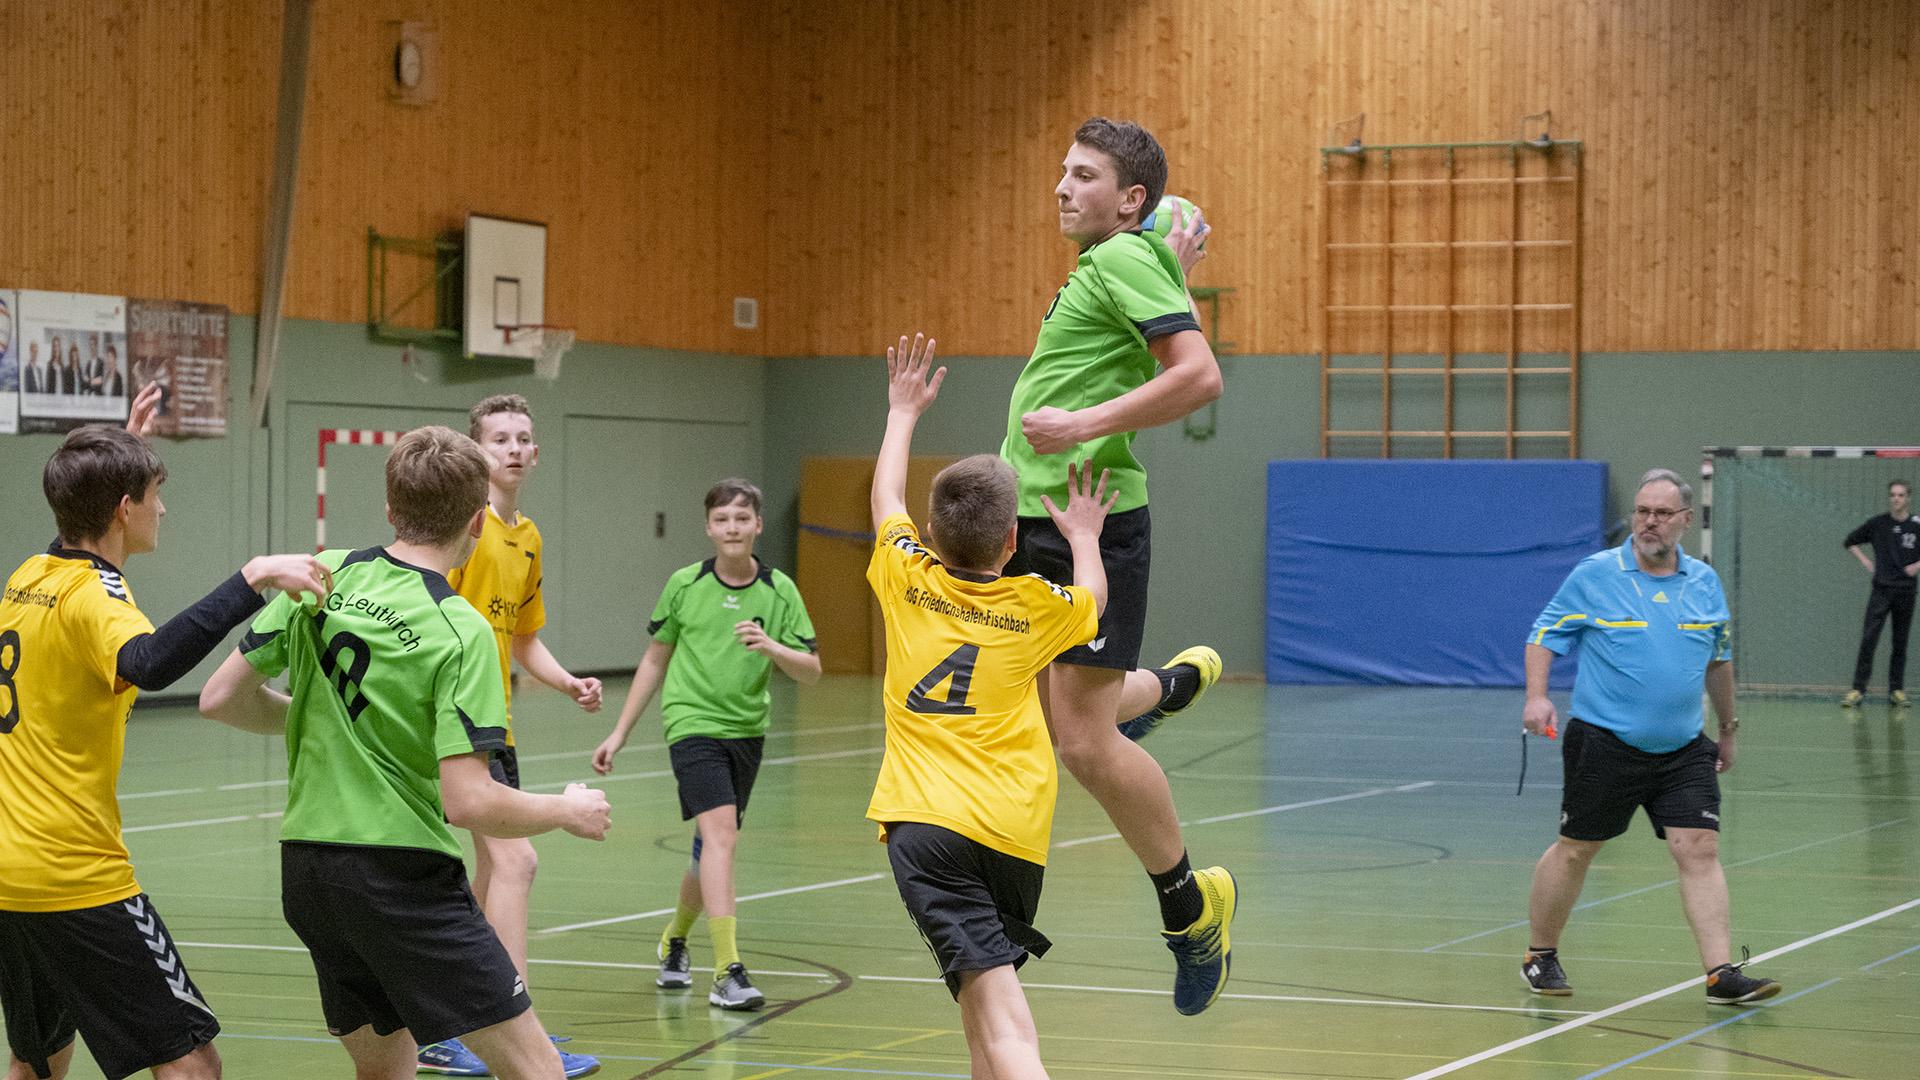 086Slider_mB_tsg_leutkirch_handball